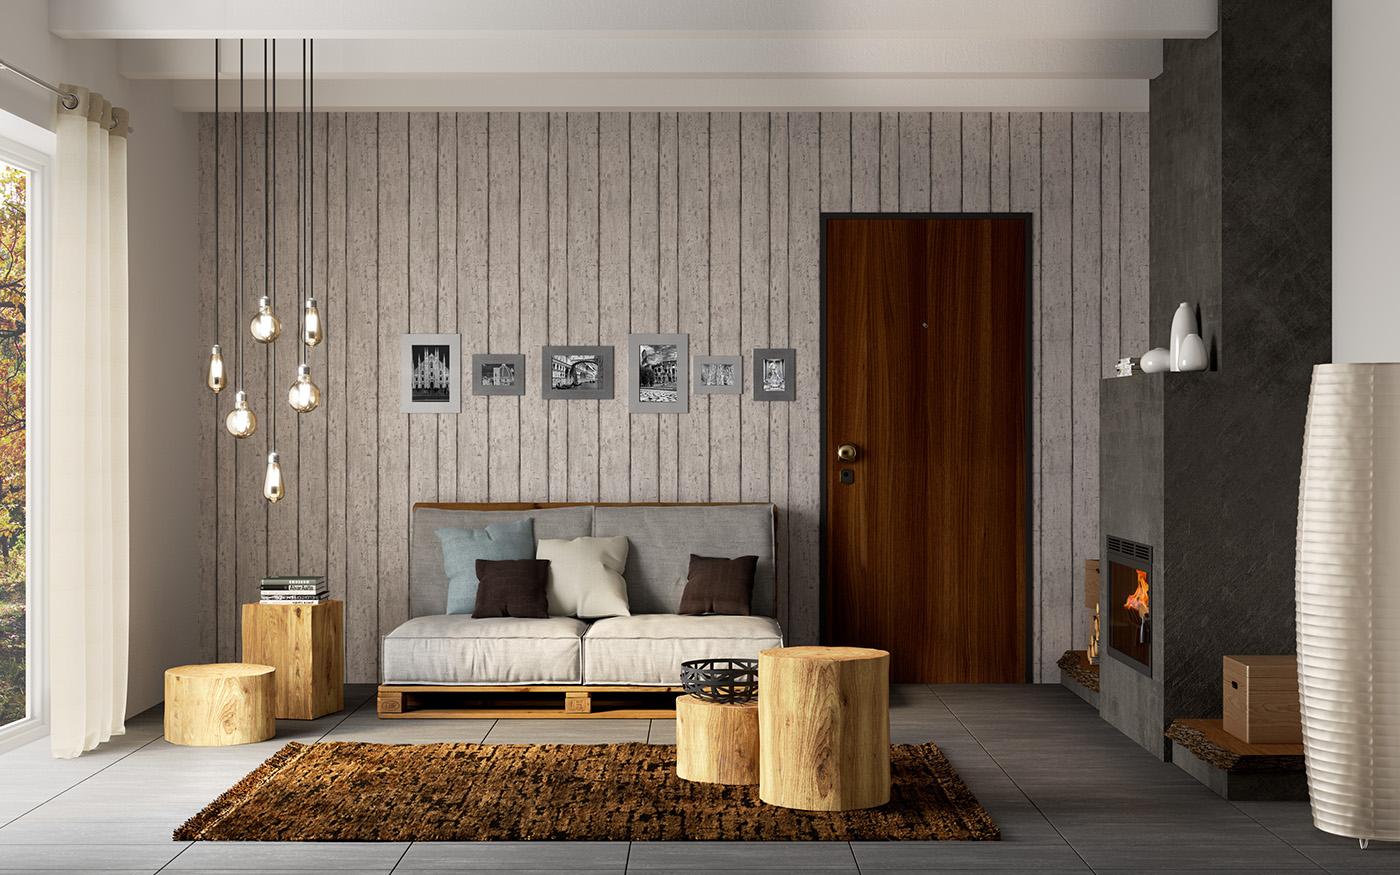 leroy merlin autumn project 2016 on behance. Black Bedroom Furniture Sets. Home Design Ideas